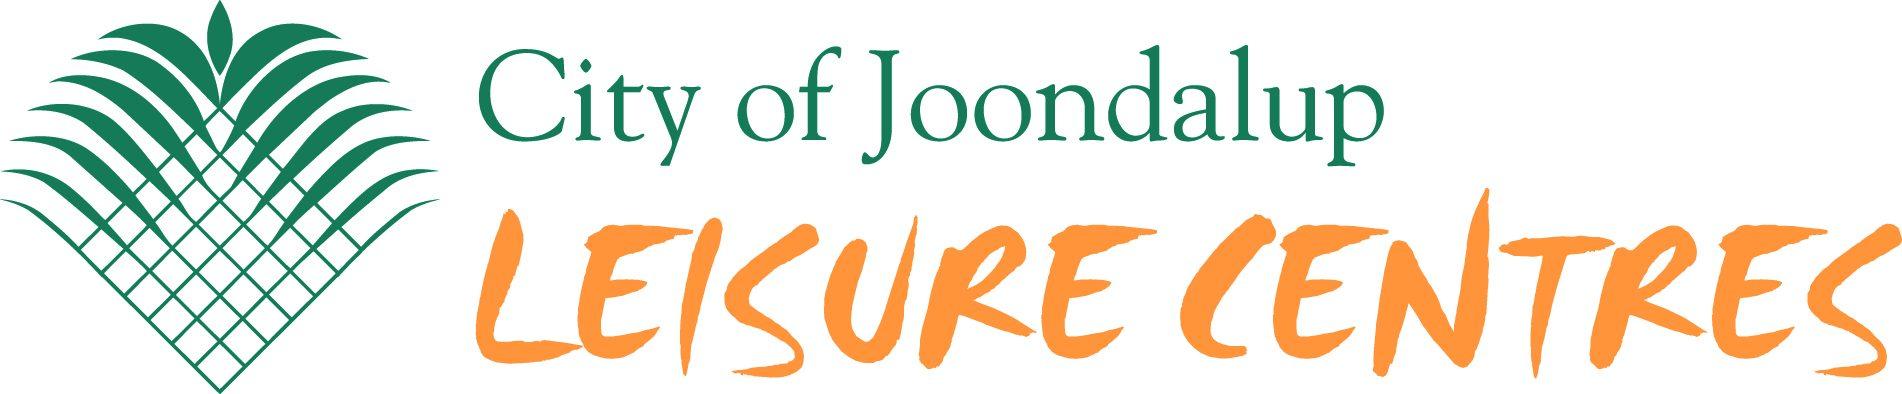 Joon pres - Orange-1